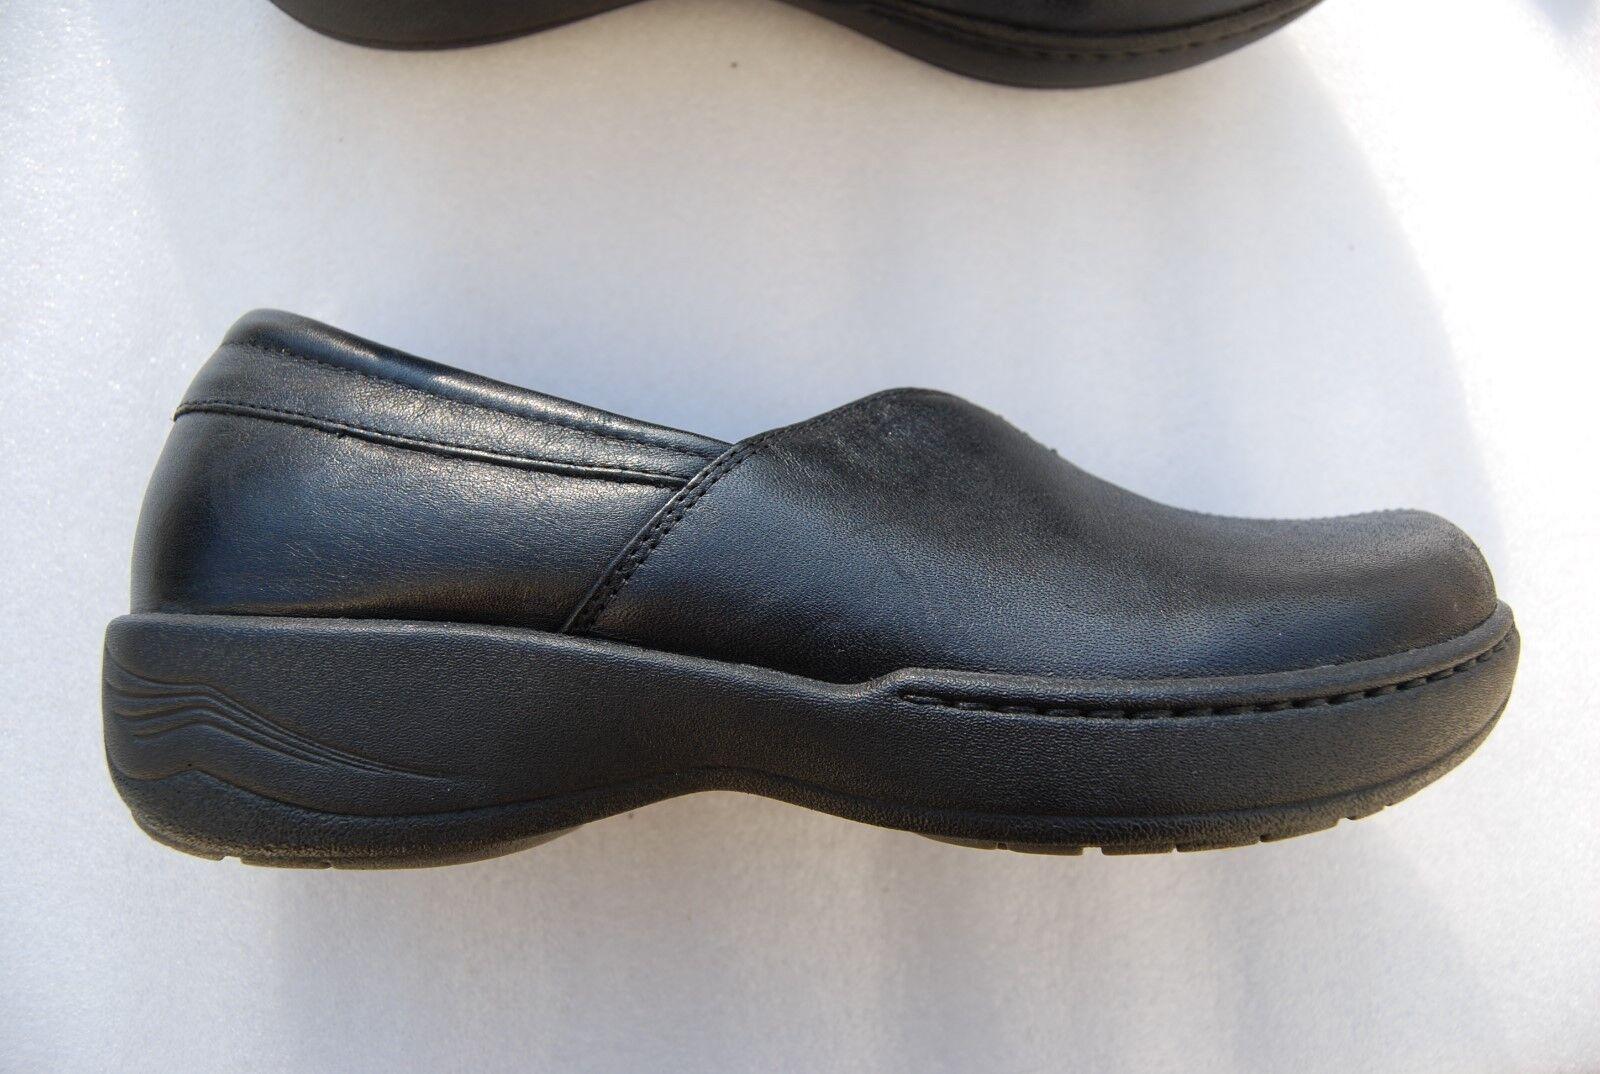 Black Leather DANSKO Low Heeled Slip On Shoes US 7.5 - 8